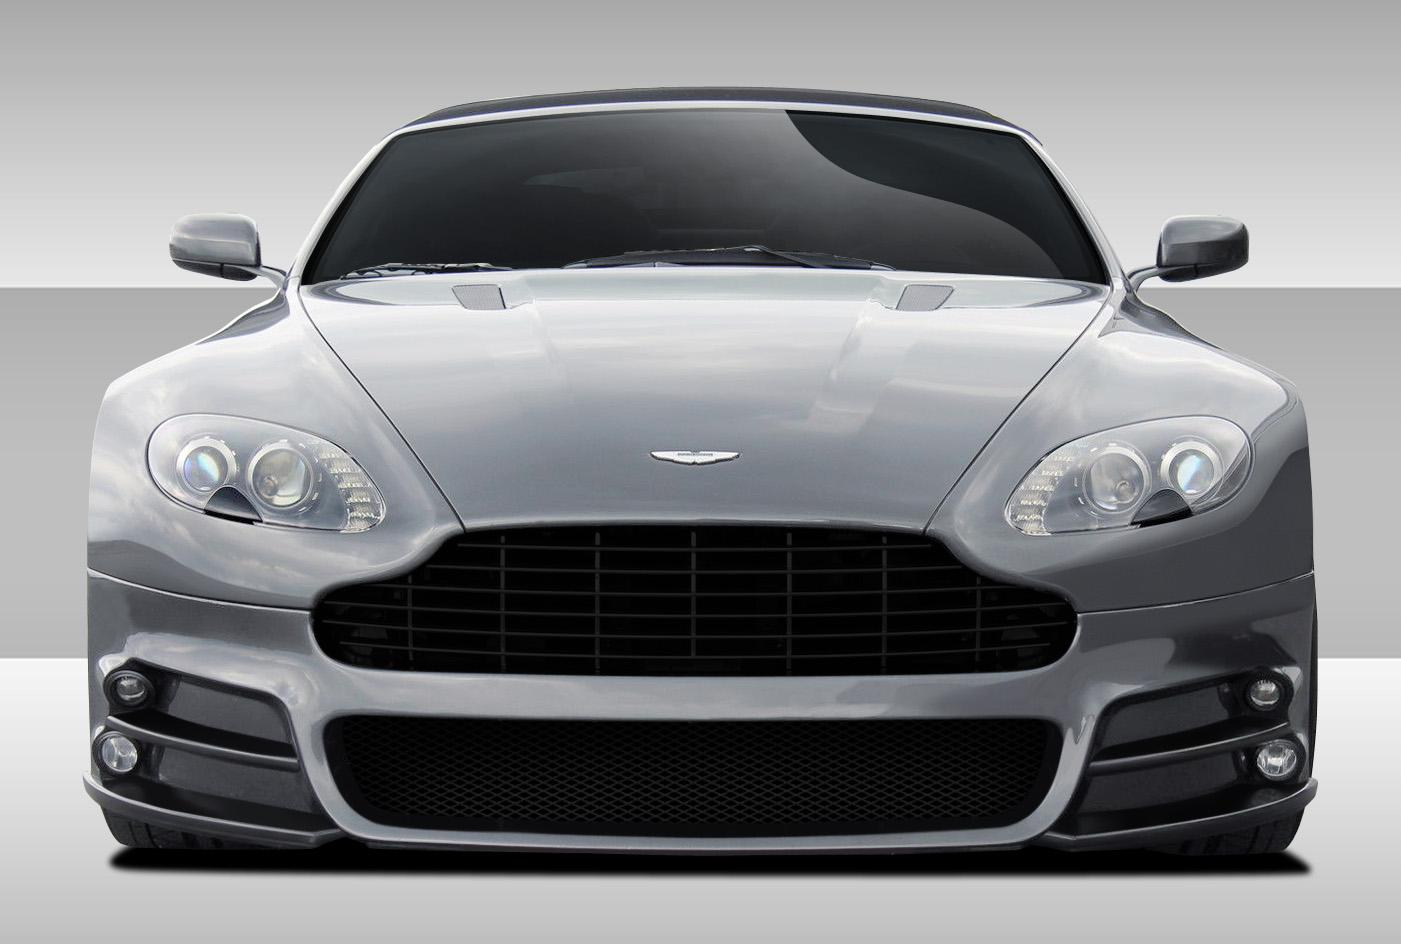 Duraflex 109644 | Aston Martin Vantage Eros Version 1 Front Bumper Cover  1 Piece; 2006 2016